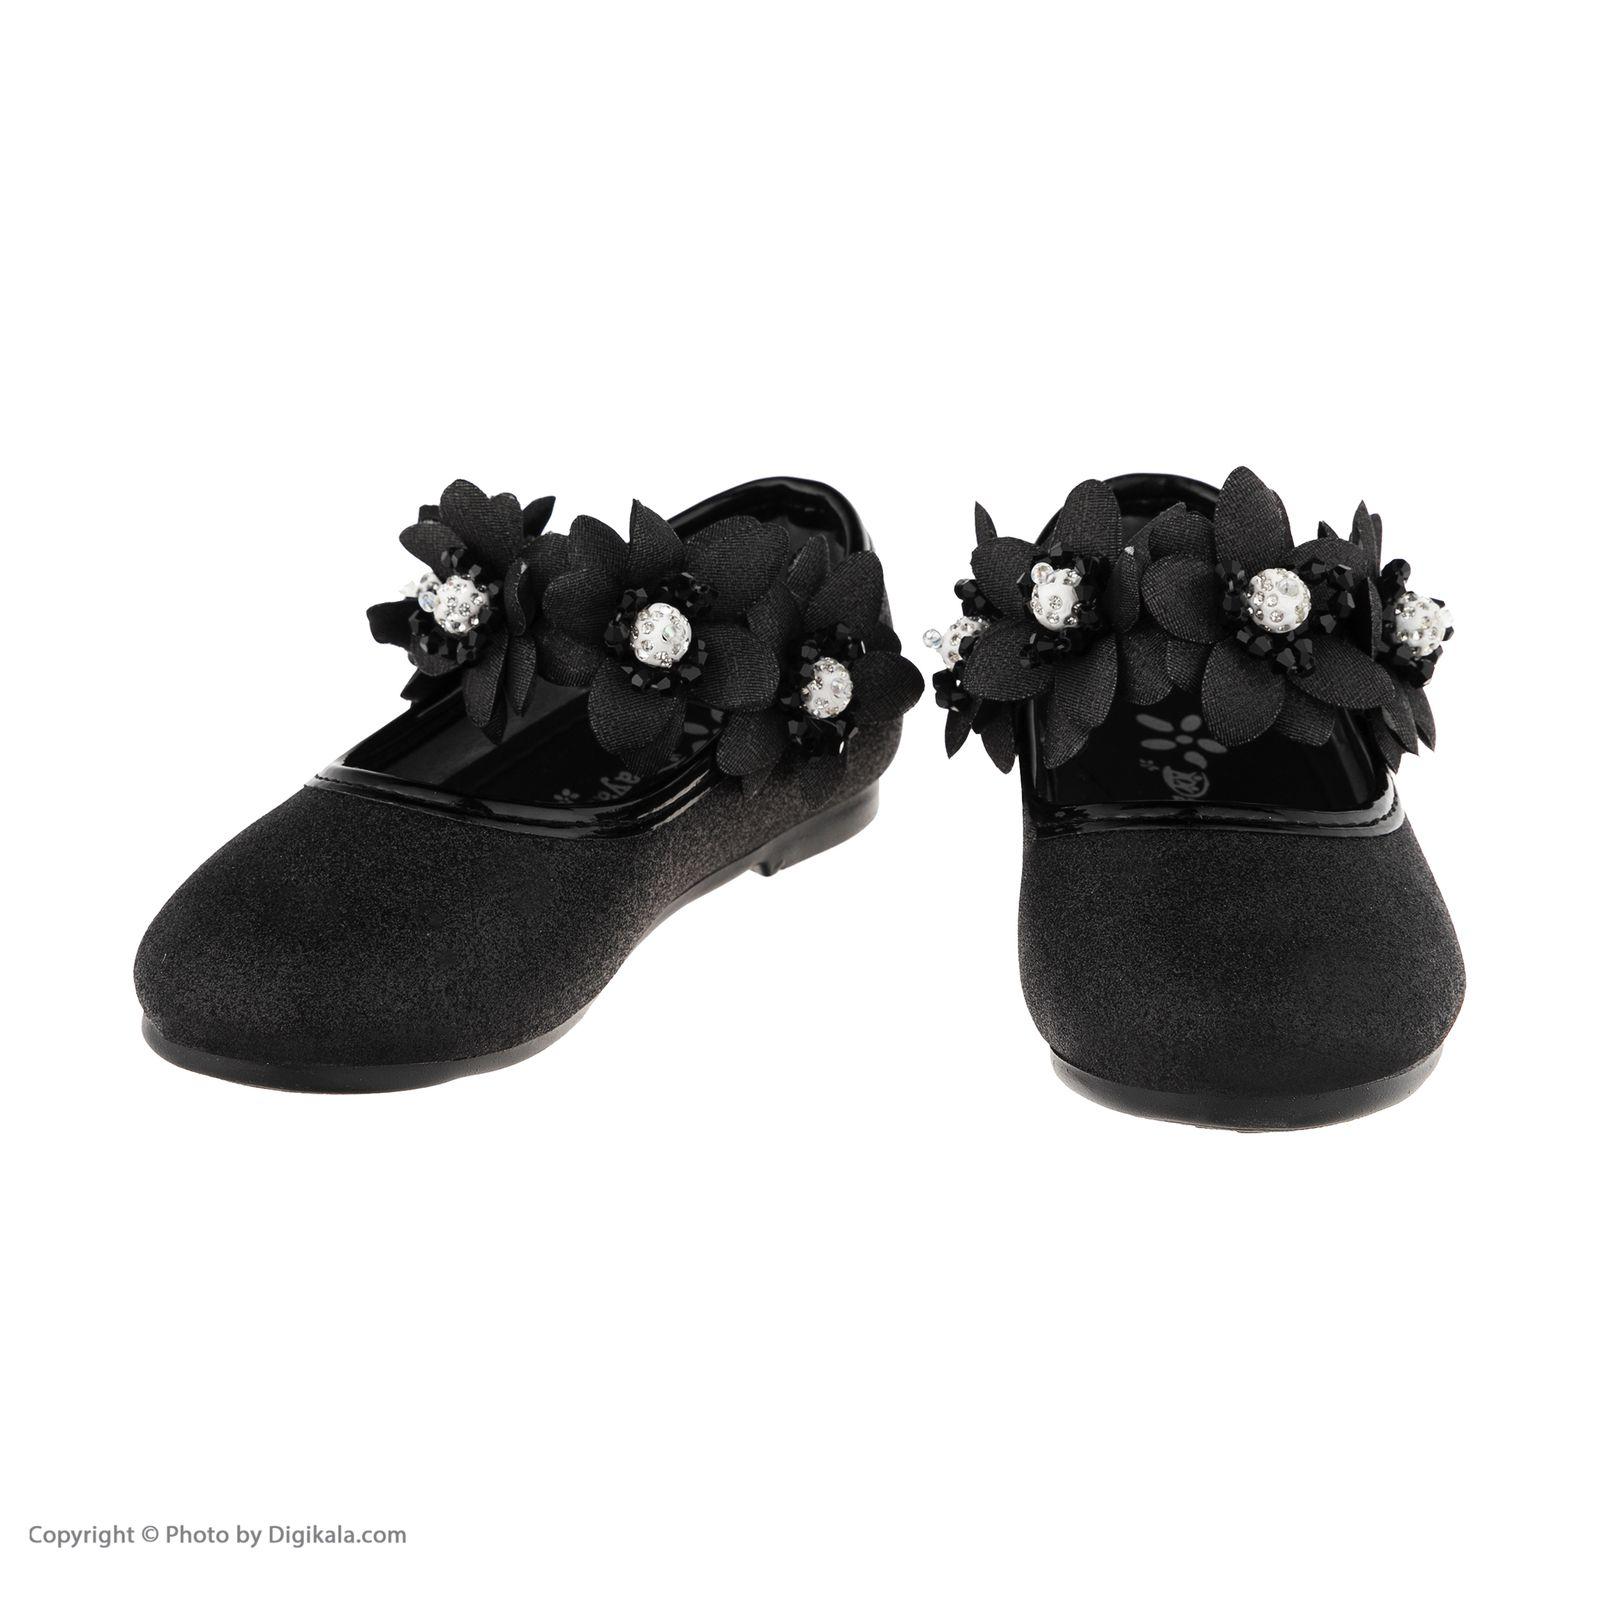 کفش دخترانه کد pa-1036 -  - 4